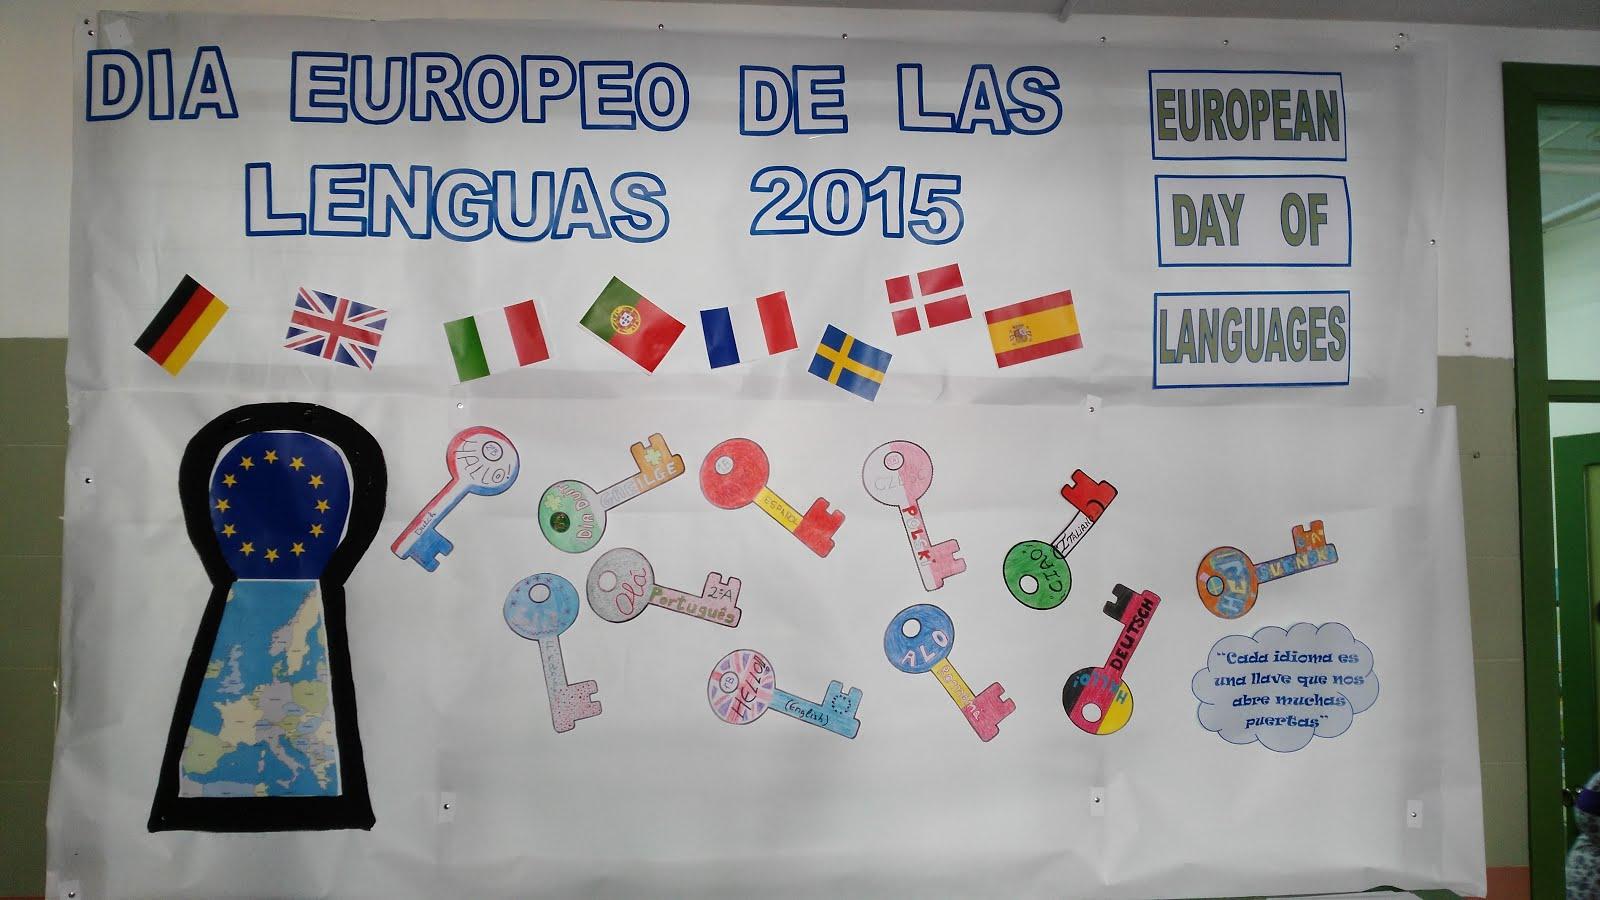 Día Europeo de las Lenguas 2015